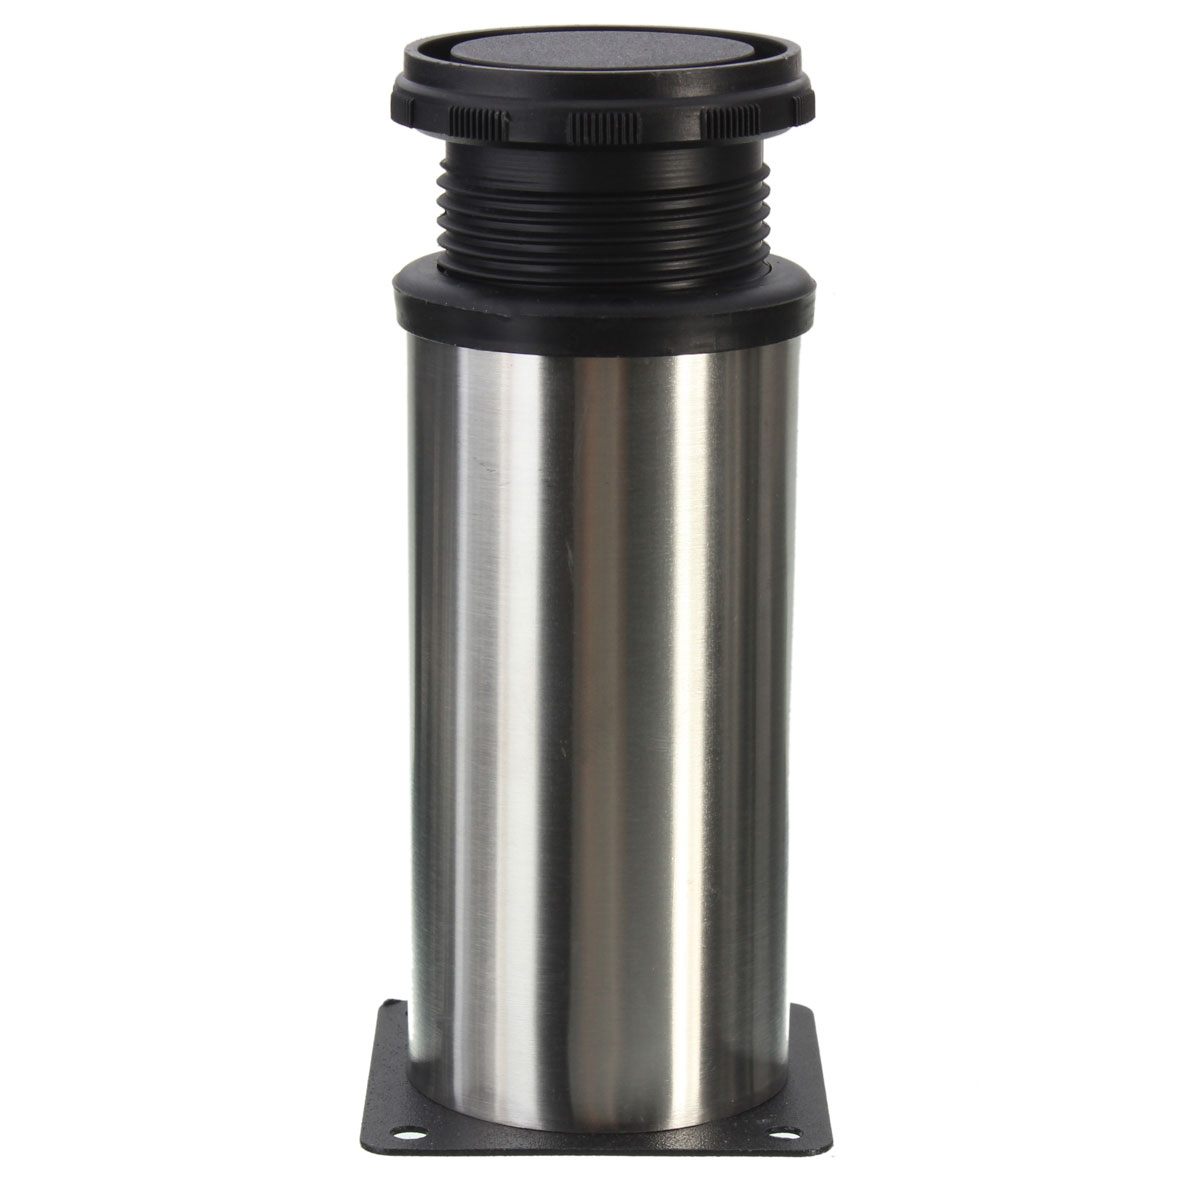 4Pcs Adjustable Cabinet Legs Stainless Steel Kitchen Feet ...